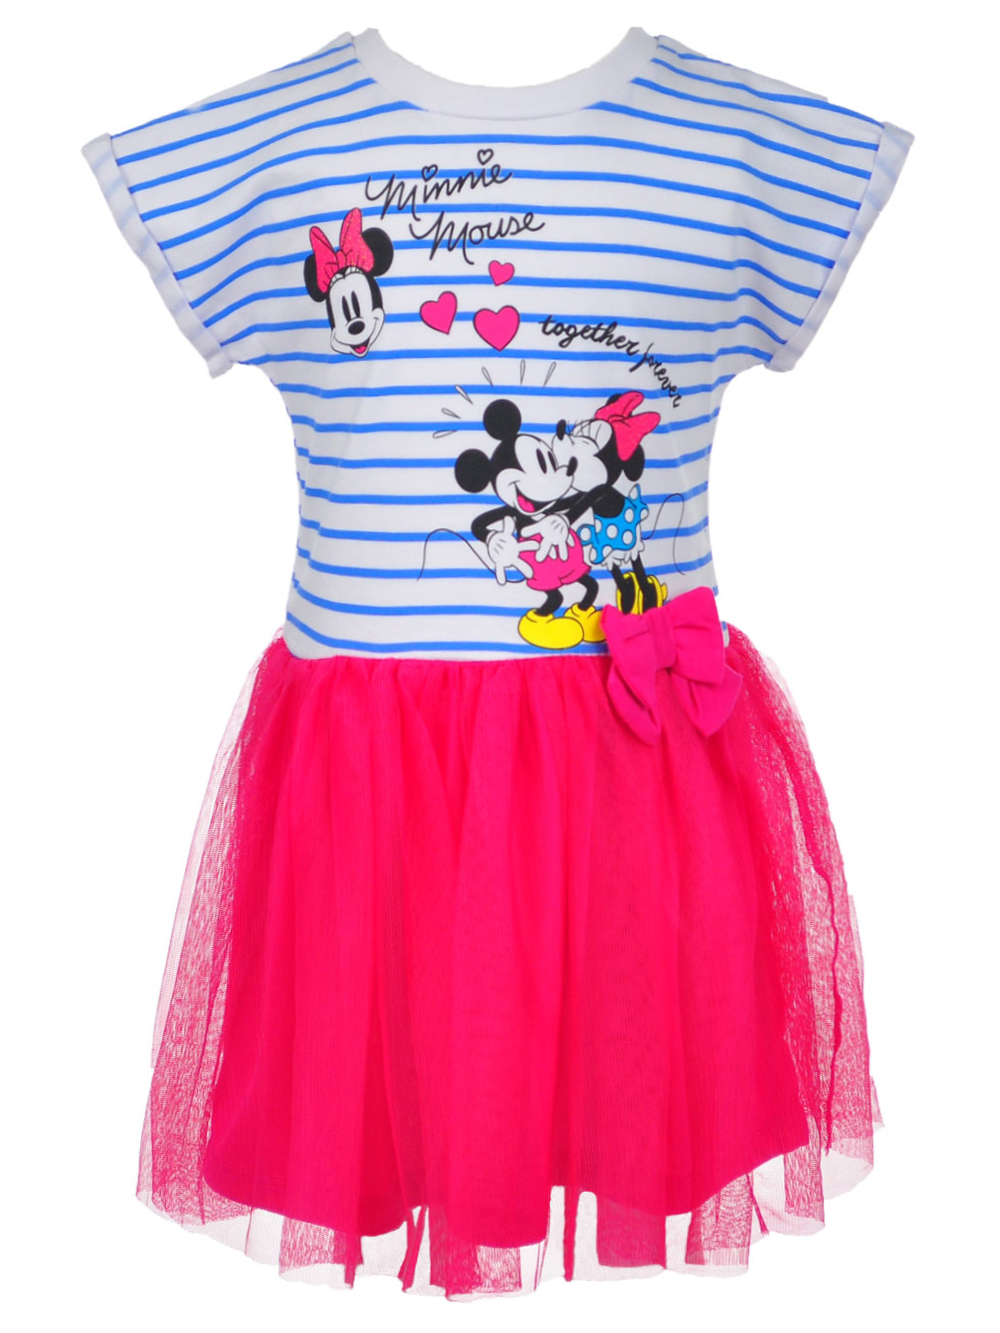 9c31aaa32cd5 Disney - Disney Minnie Mouse Girls' Dress - Walmart.com